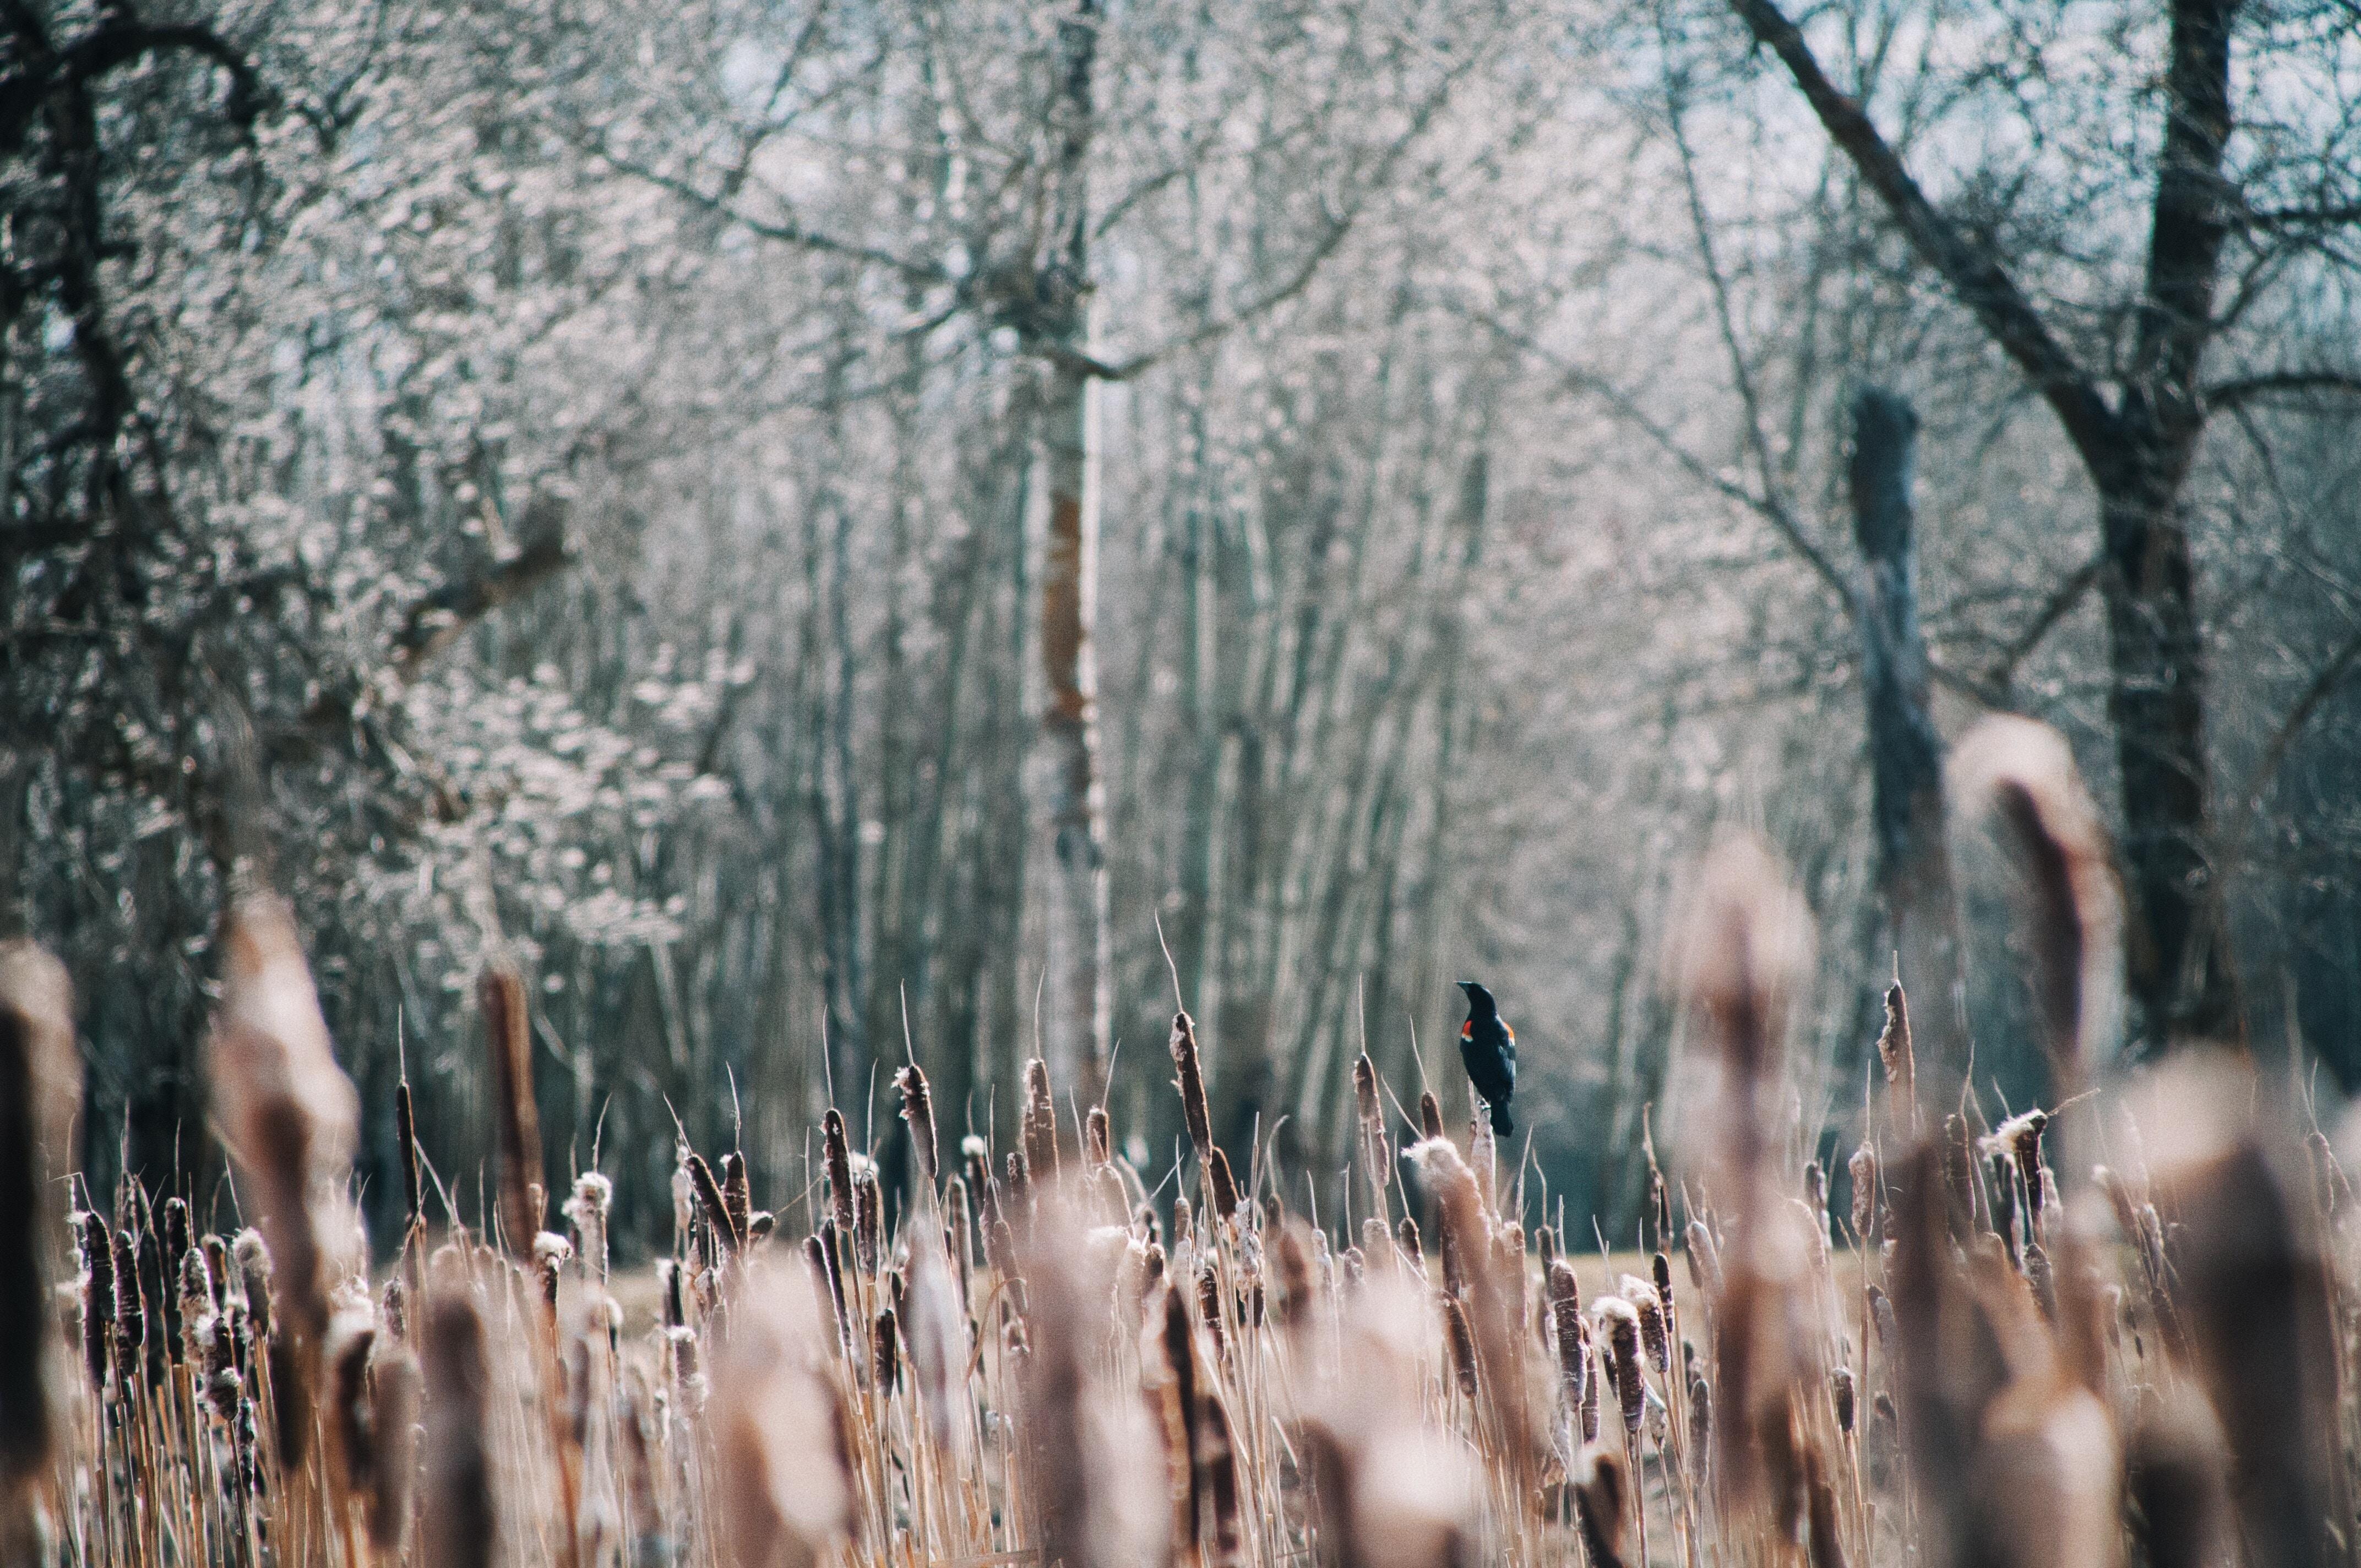 brown grass near trees